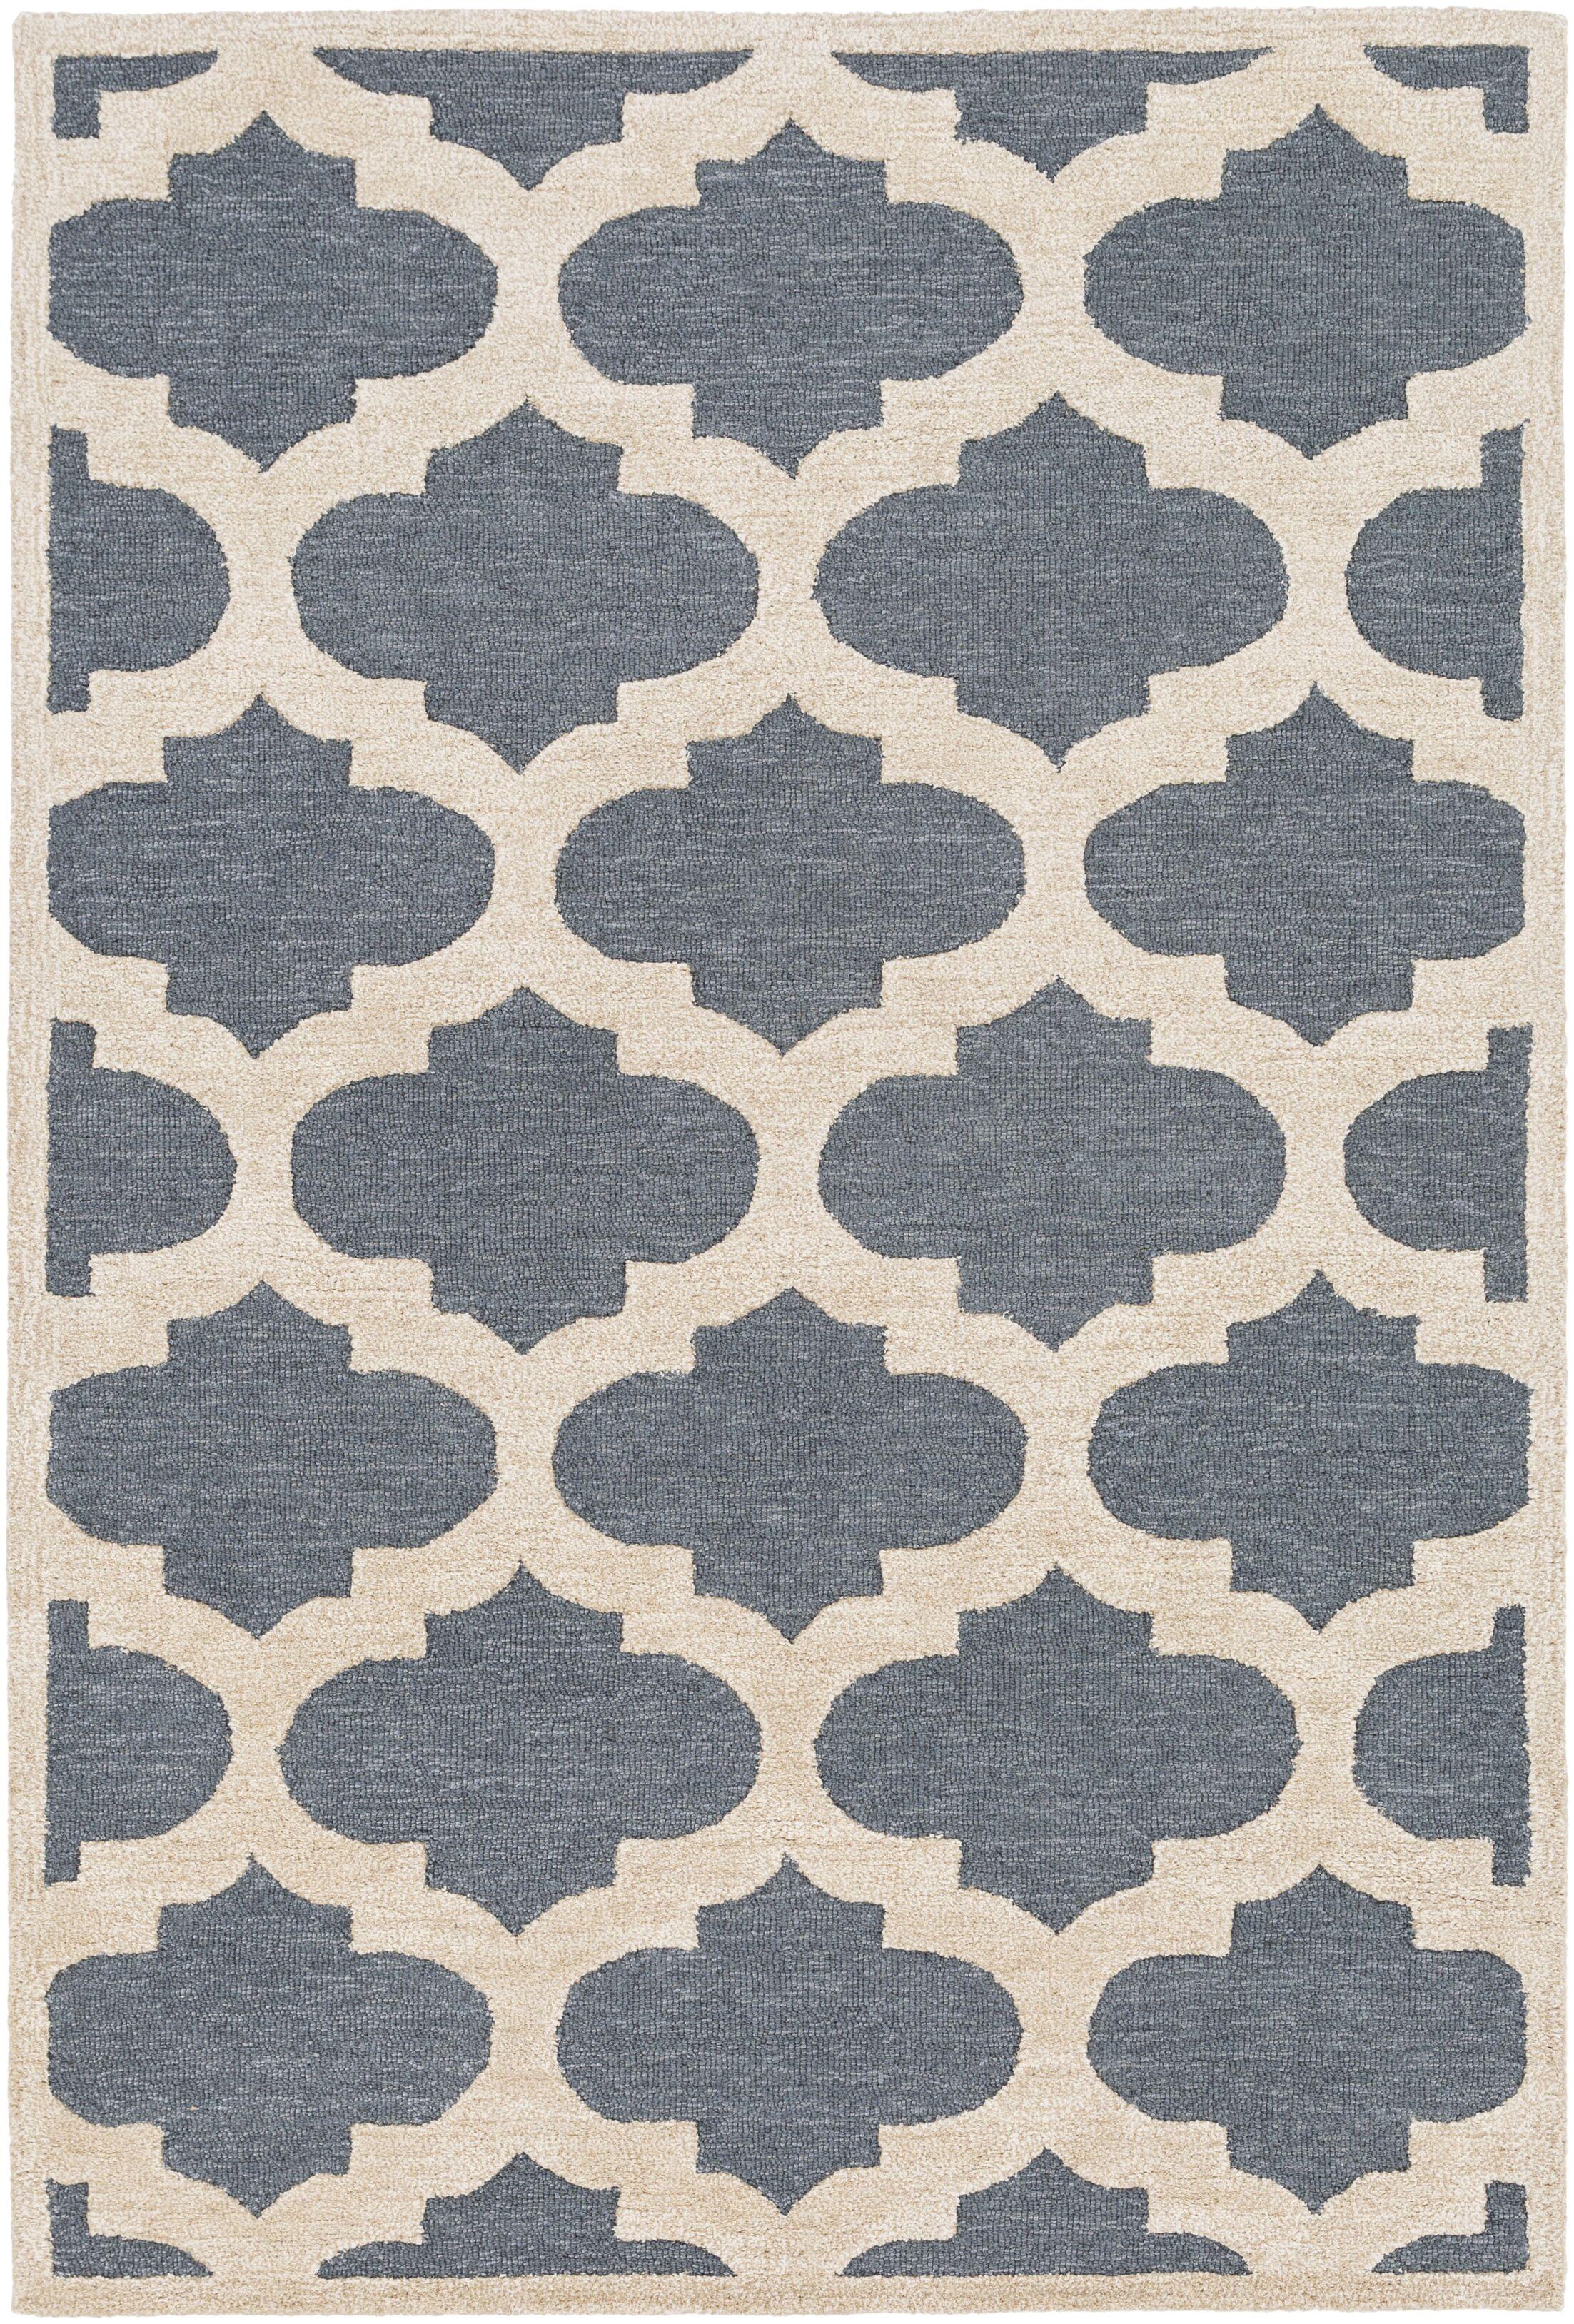 Boise Hand-Tufted Blue Area Rug Rug Size: Rectangle 5' x 7'6